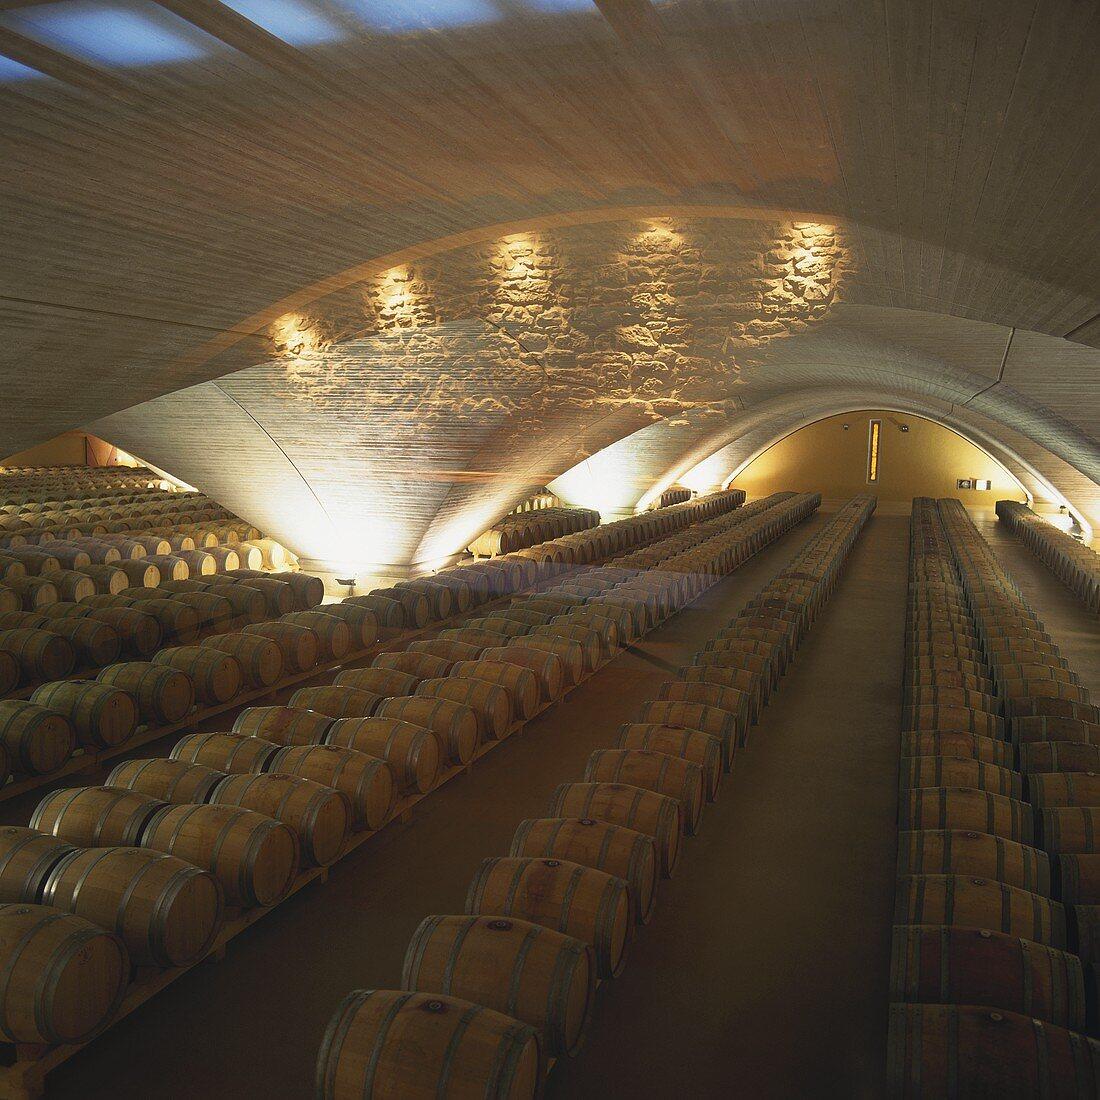 Wine cellar of Bodega Otazu, Navarra, Spain